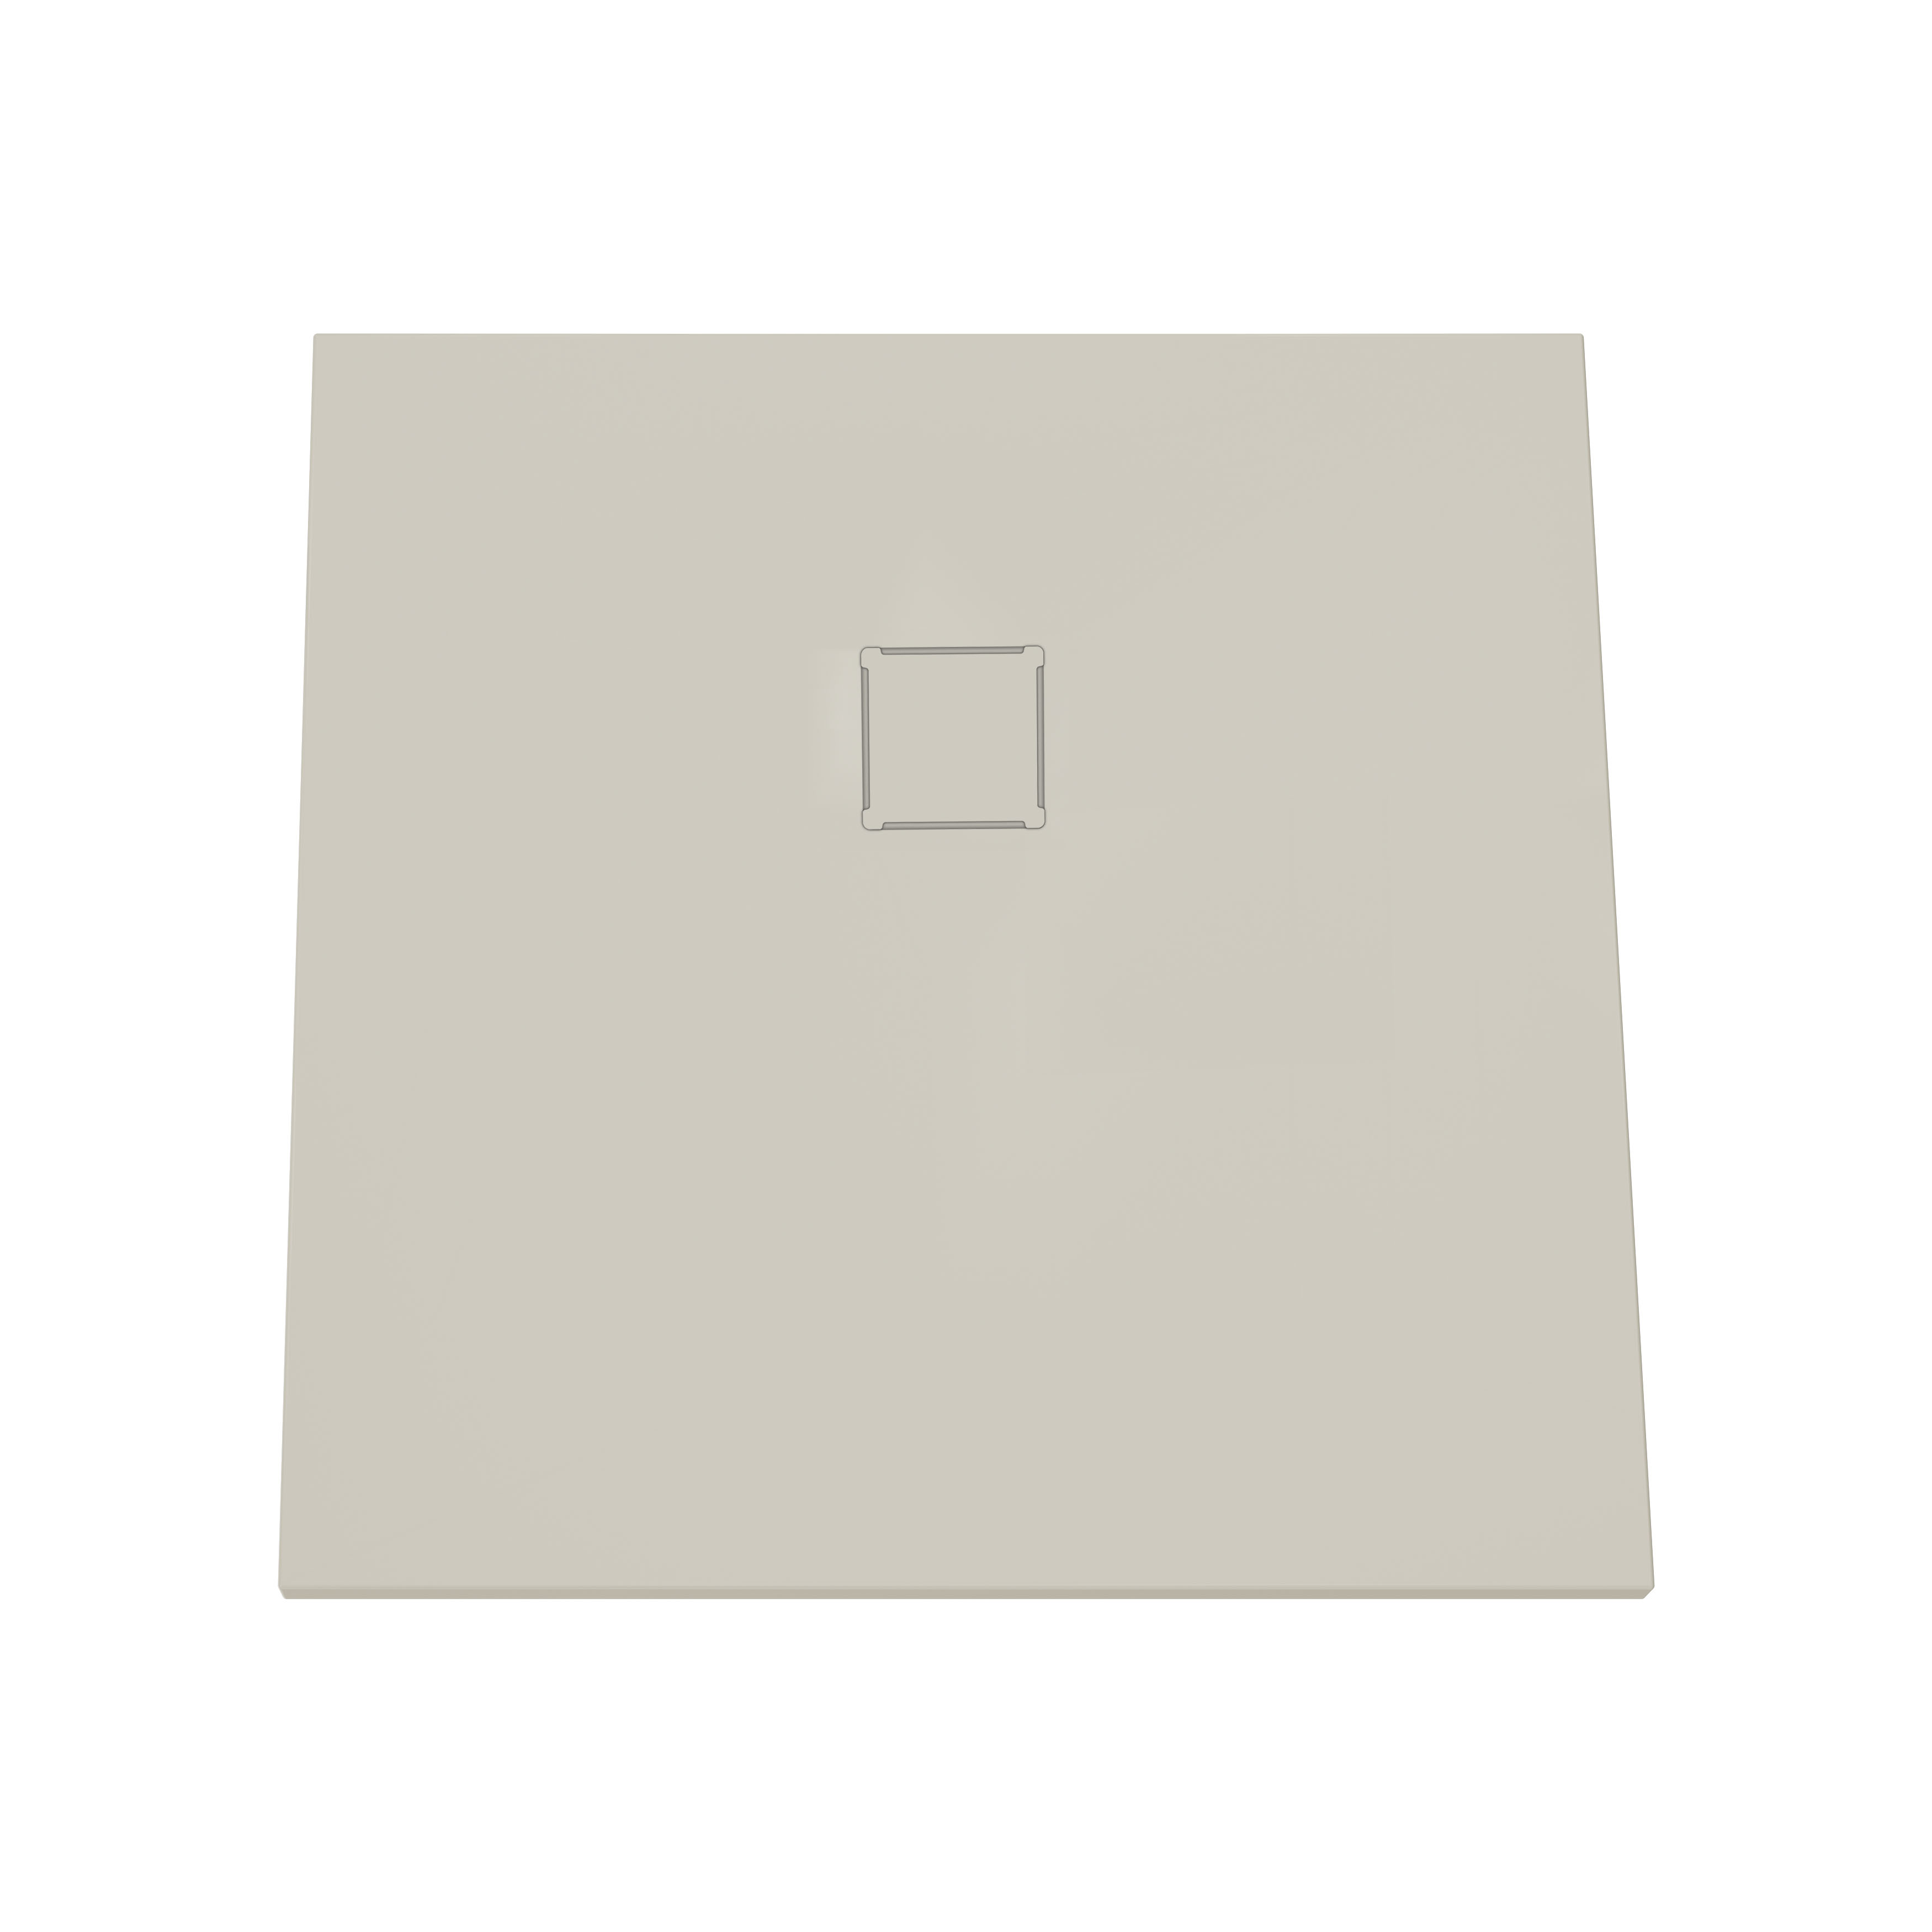 V-stone, receveur ultra plat en solid stone, 90 cm, taupe